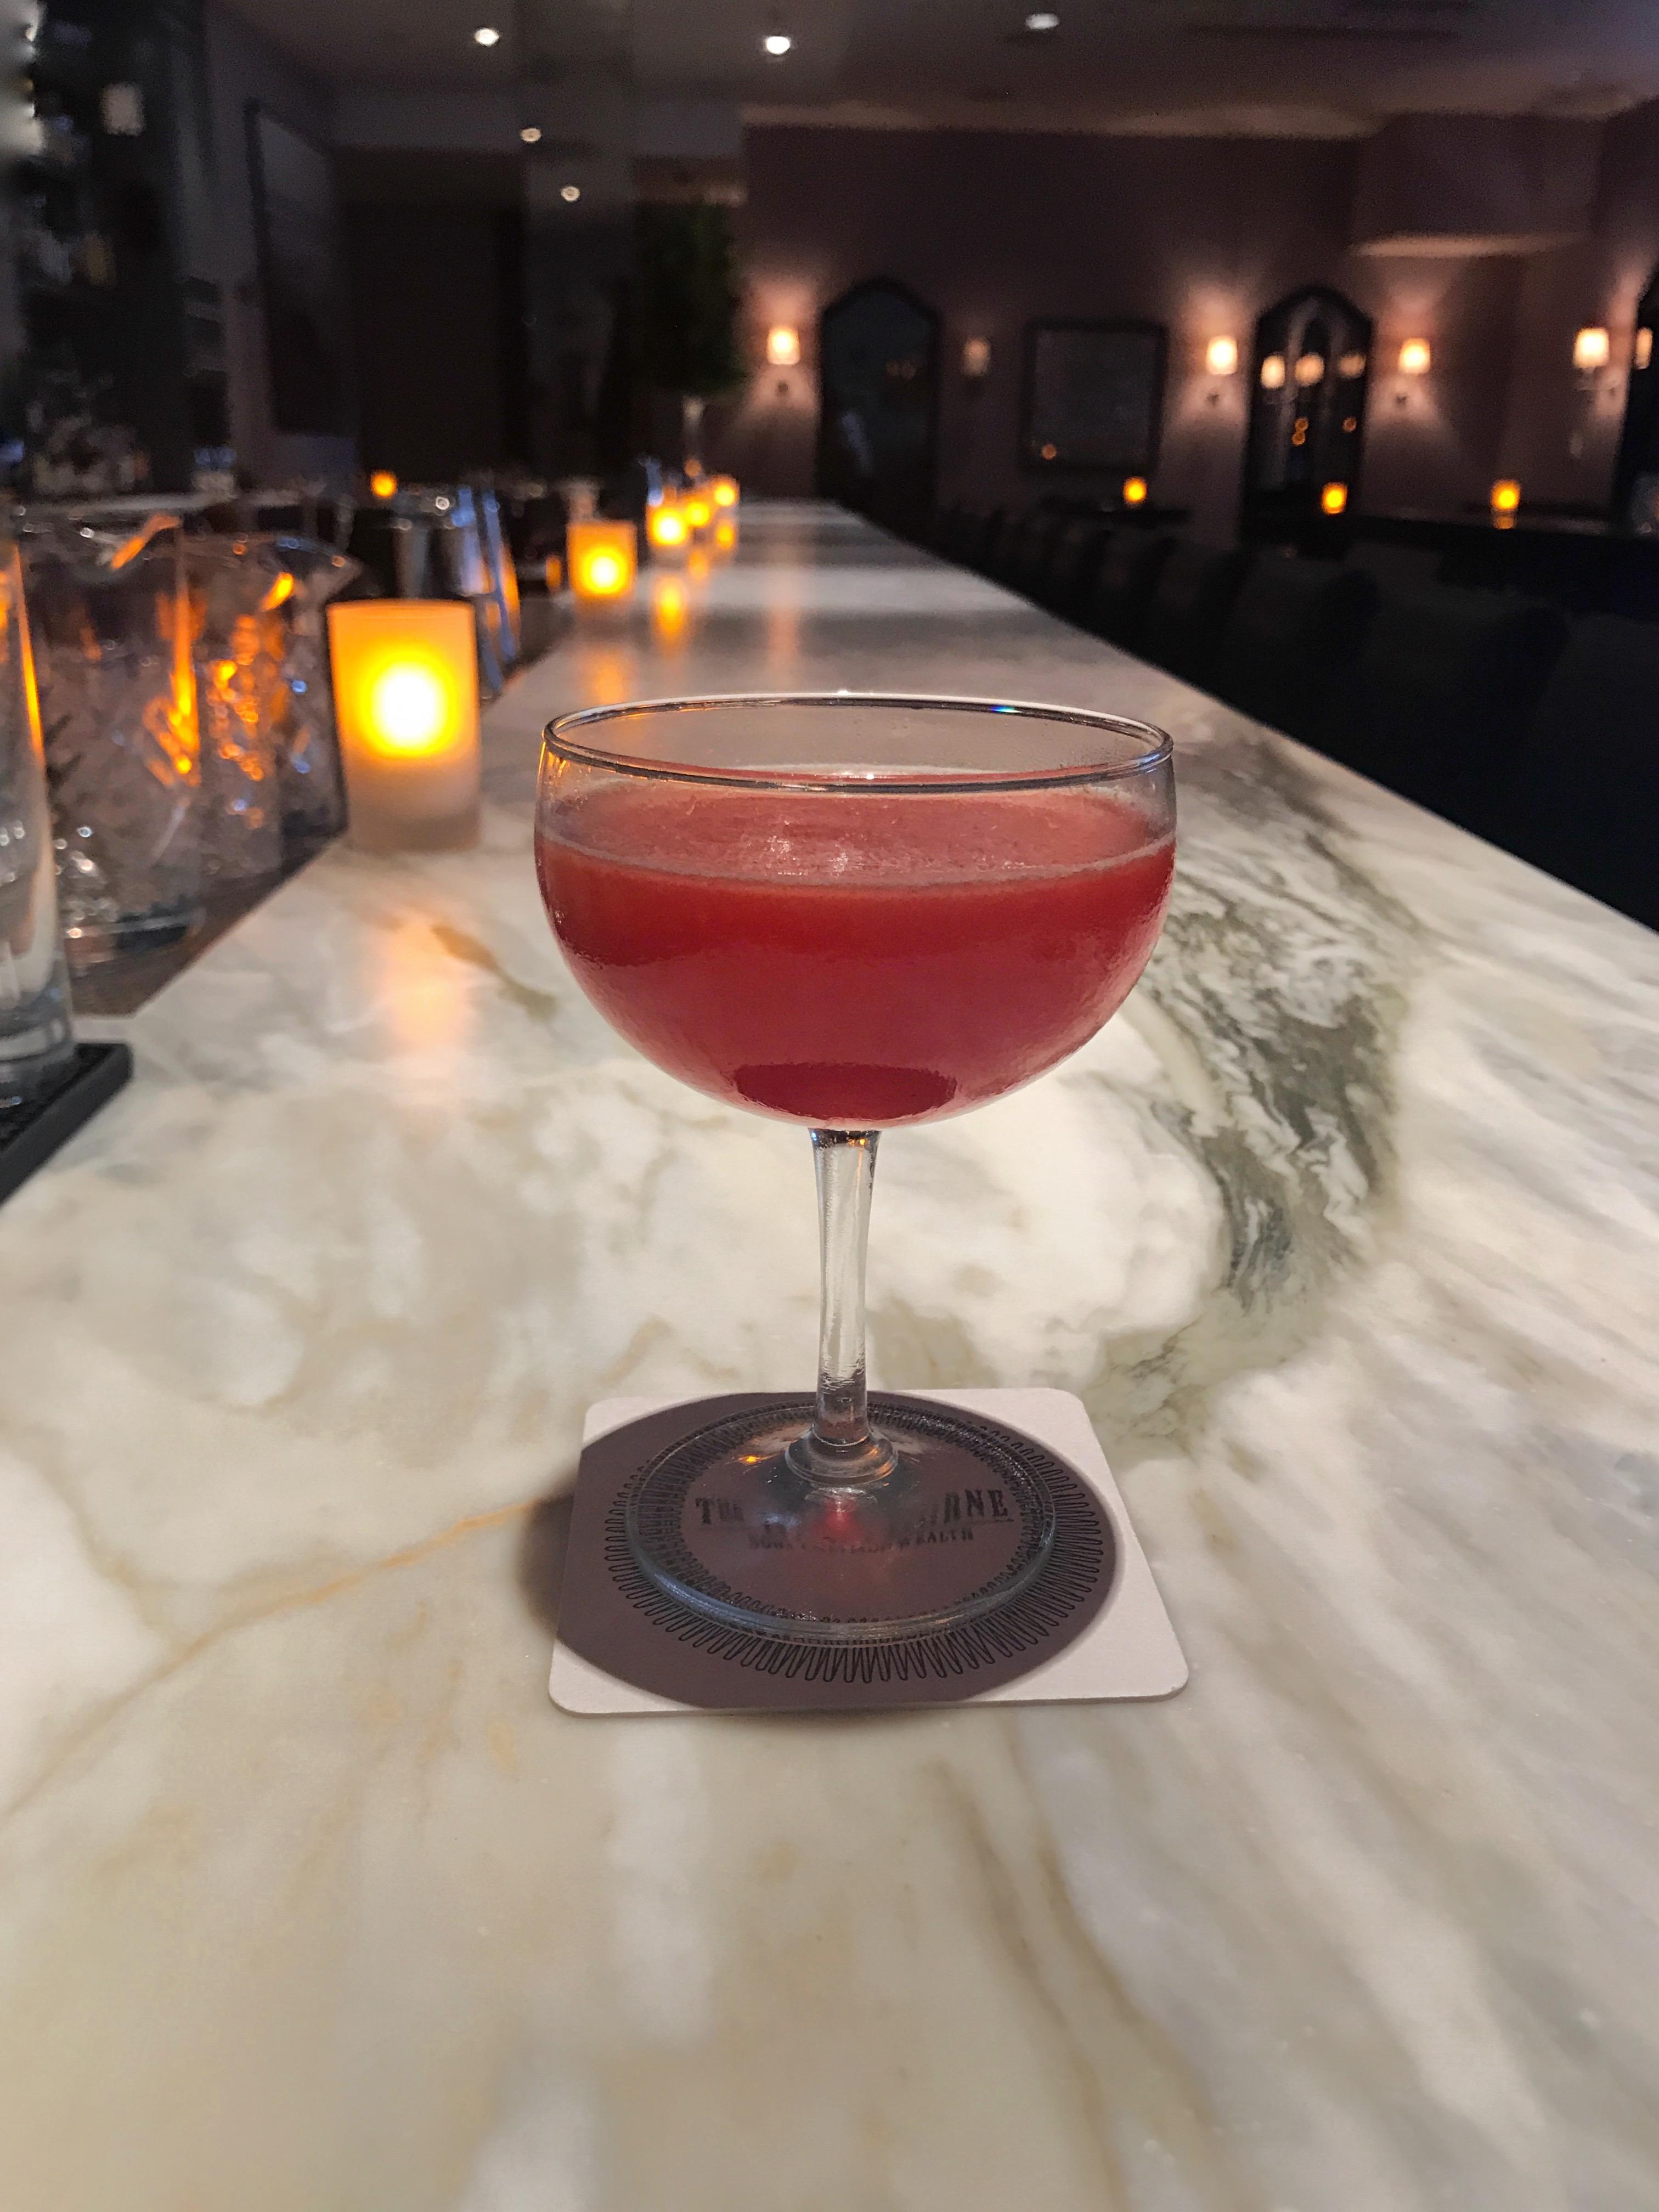 Maine State Signature Cocktail